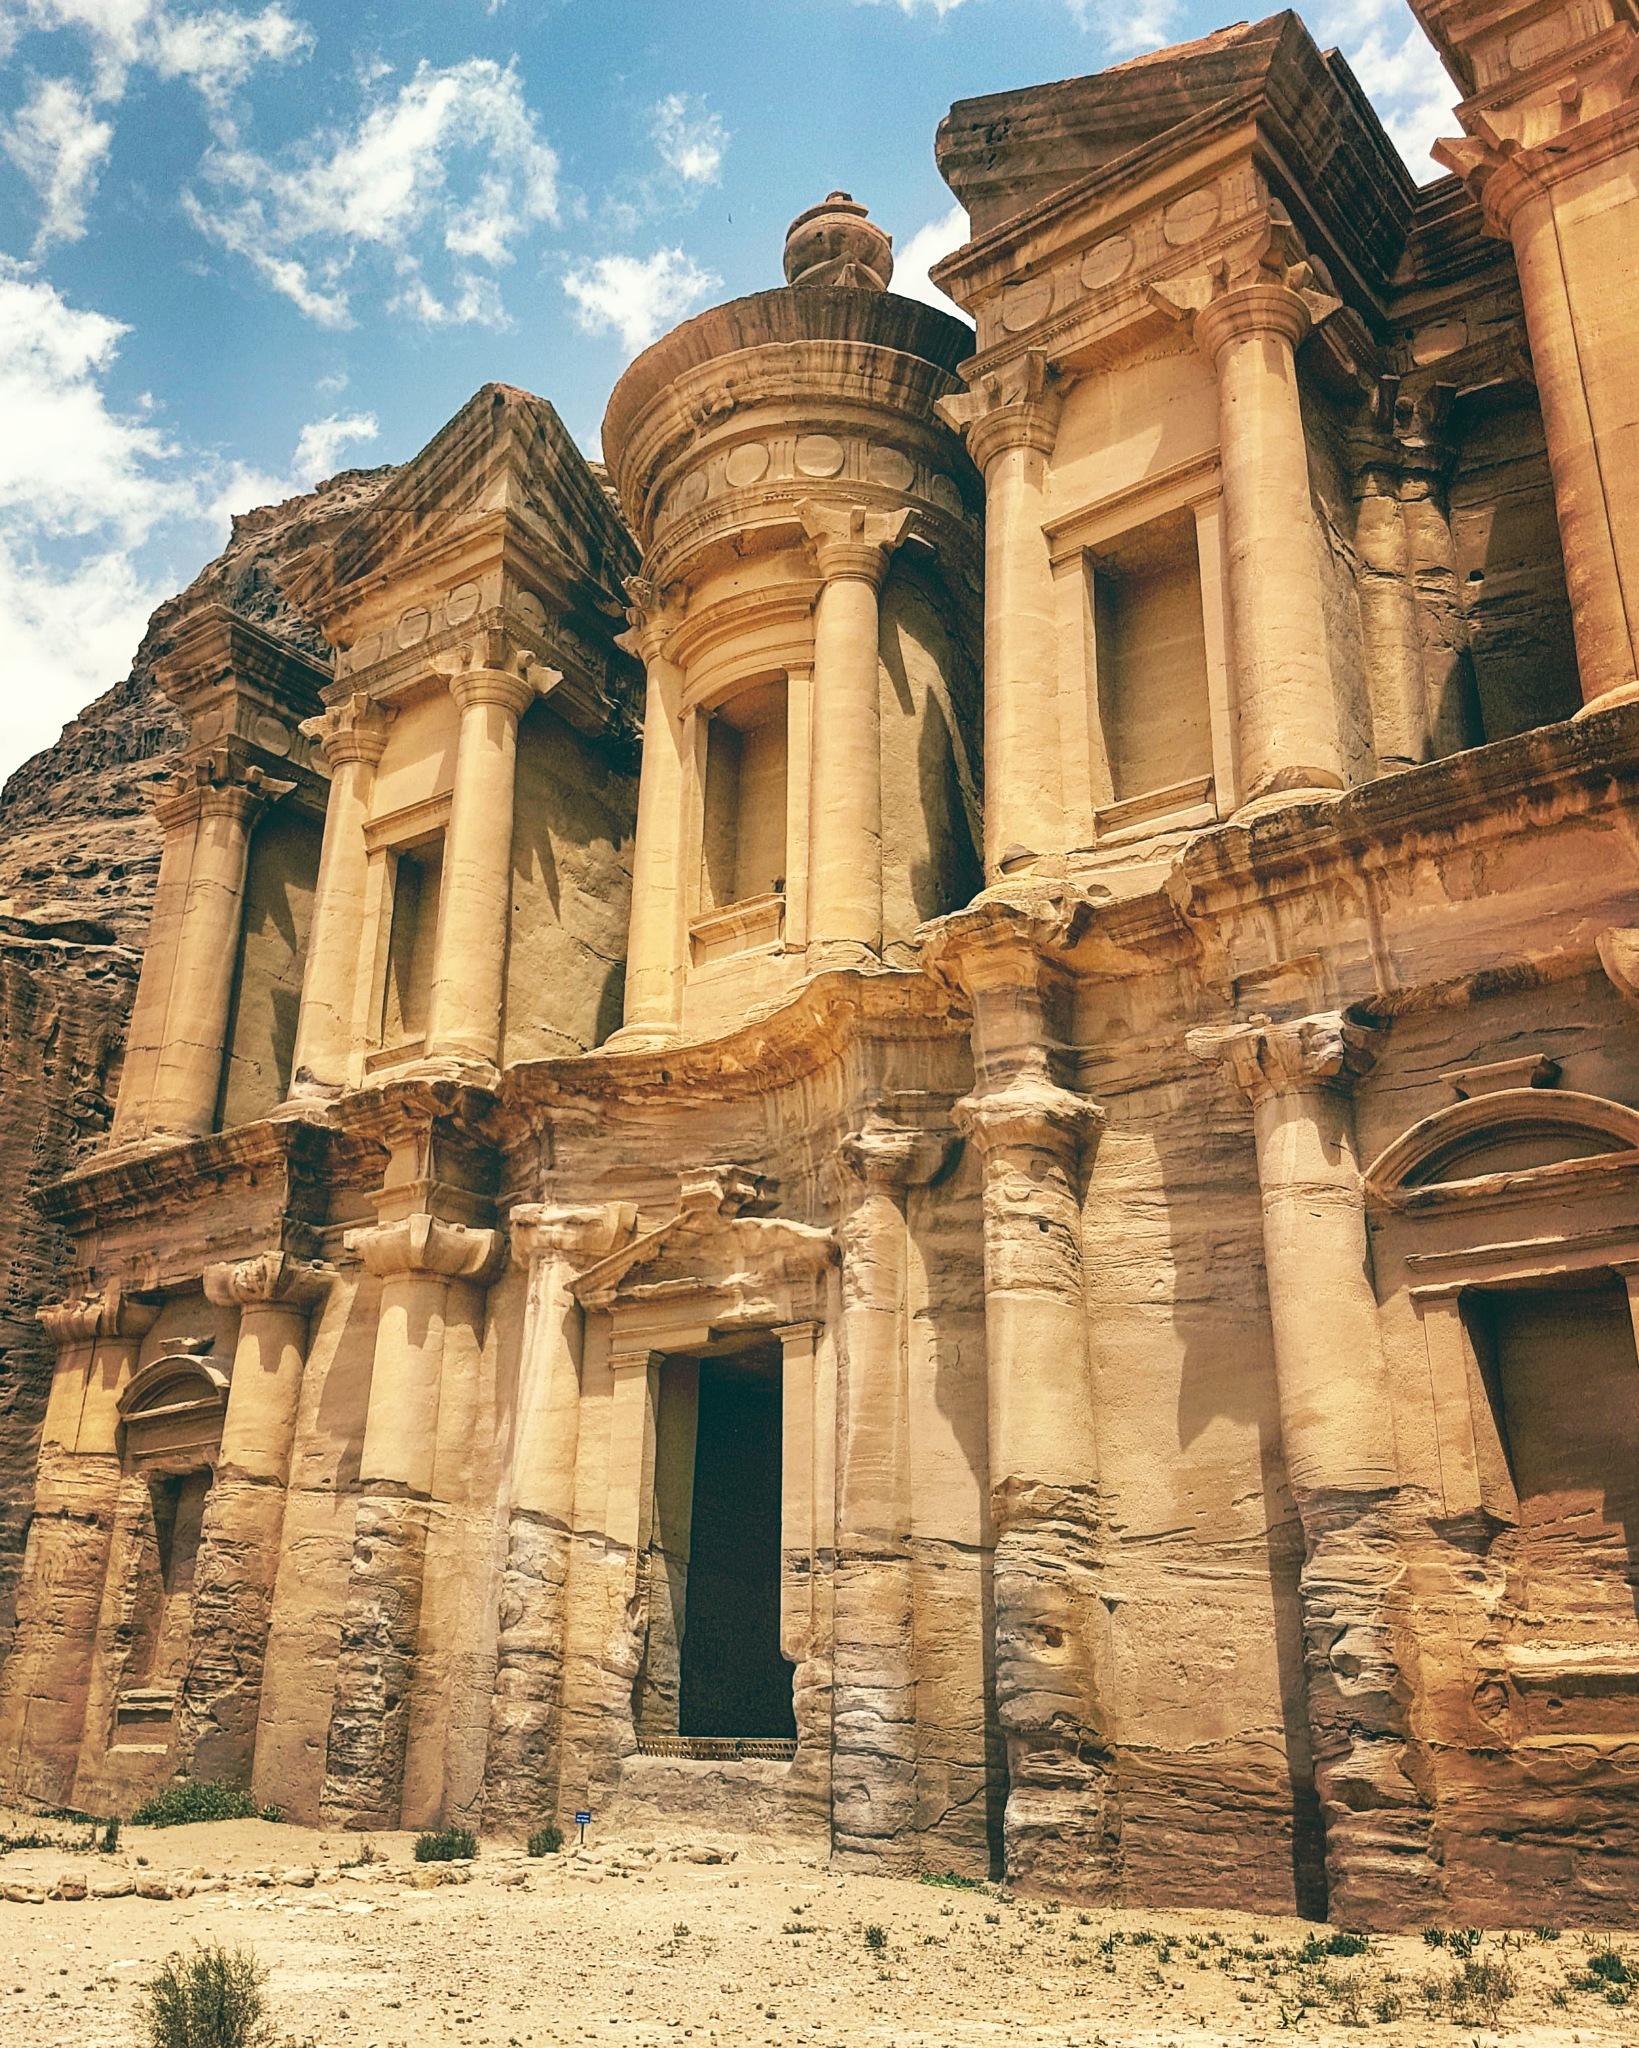 Ancient Cities by Miq Mustafa